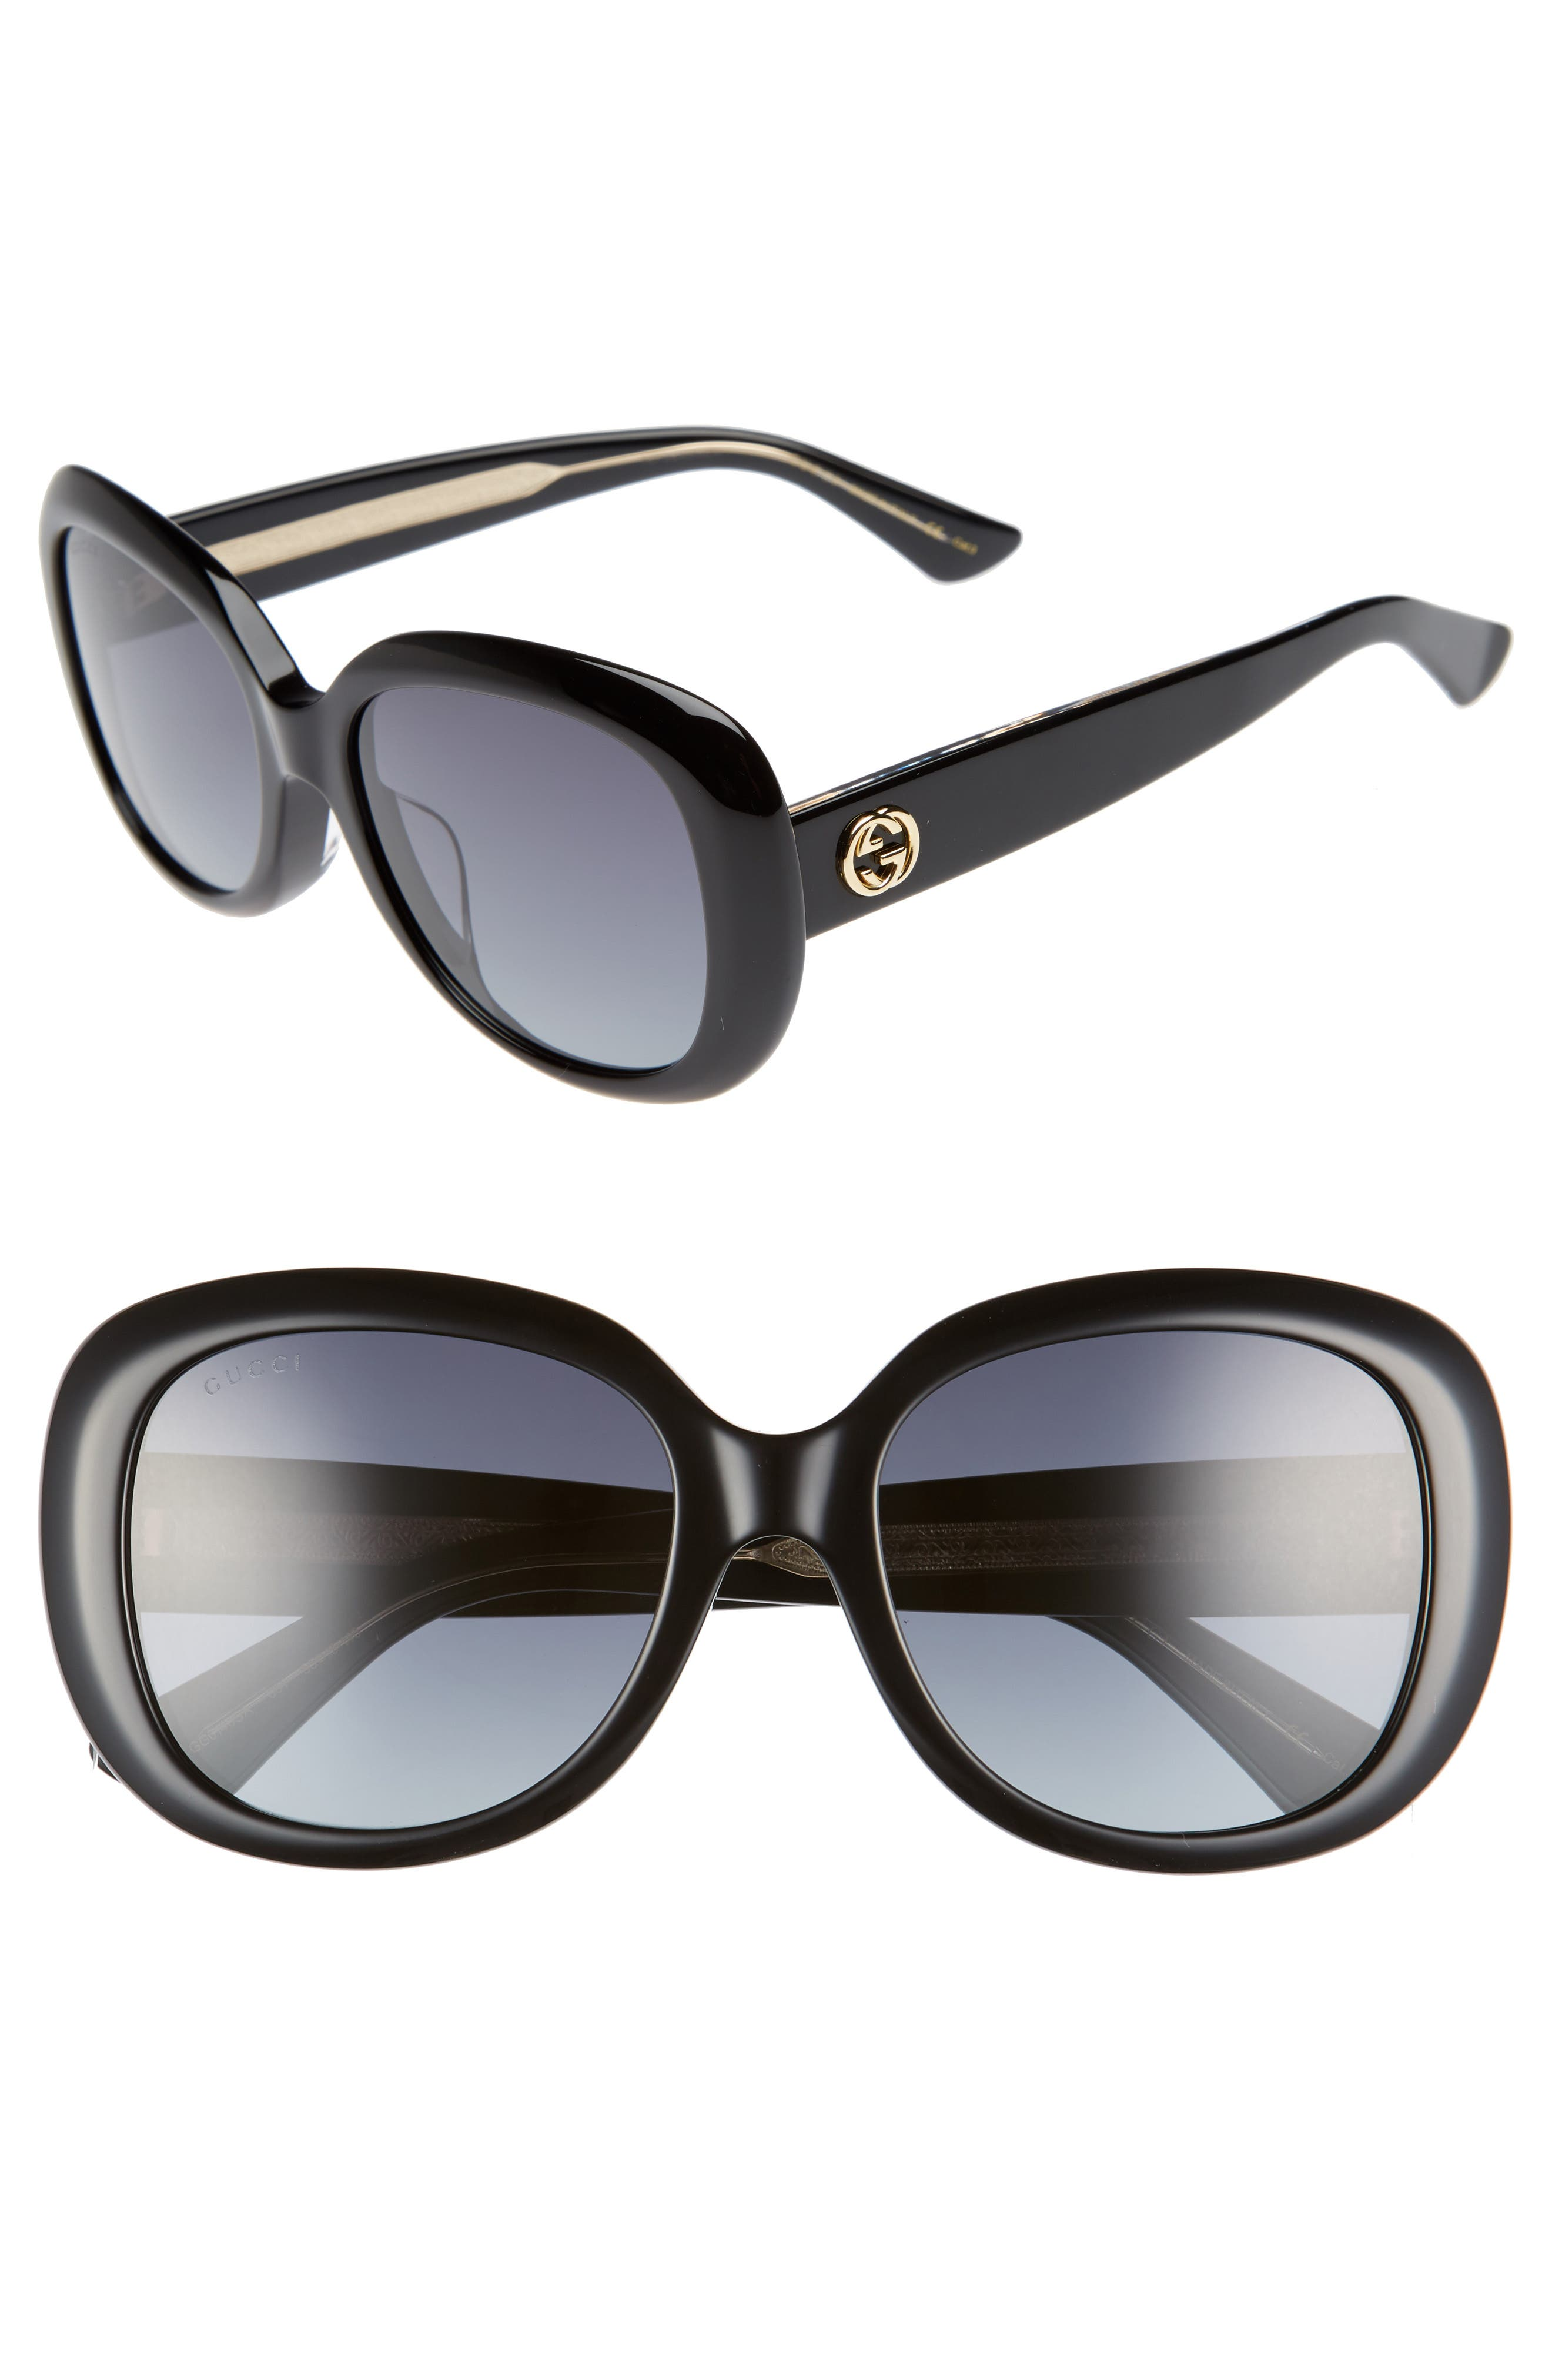 55mm Rectangular Sunglasses,                             Main thumbnail 1, color,                             001